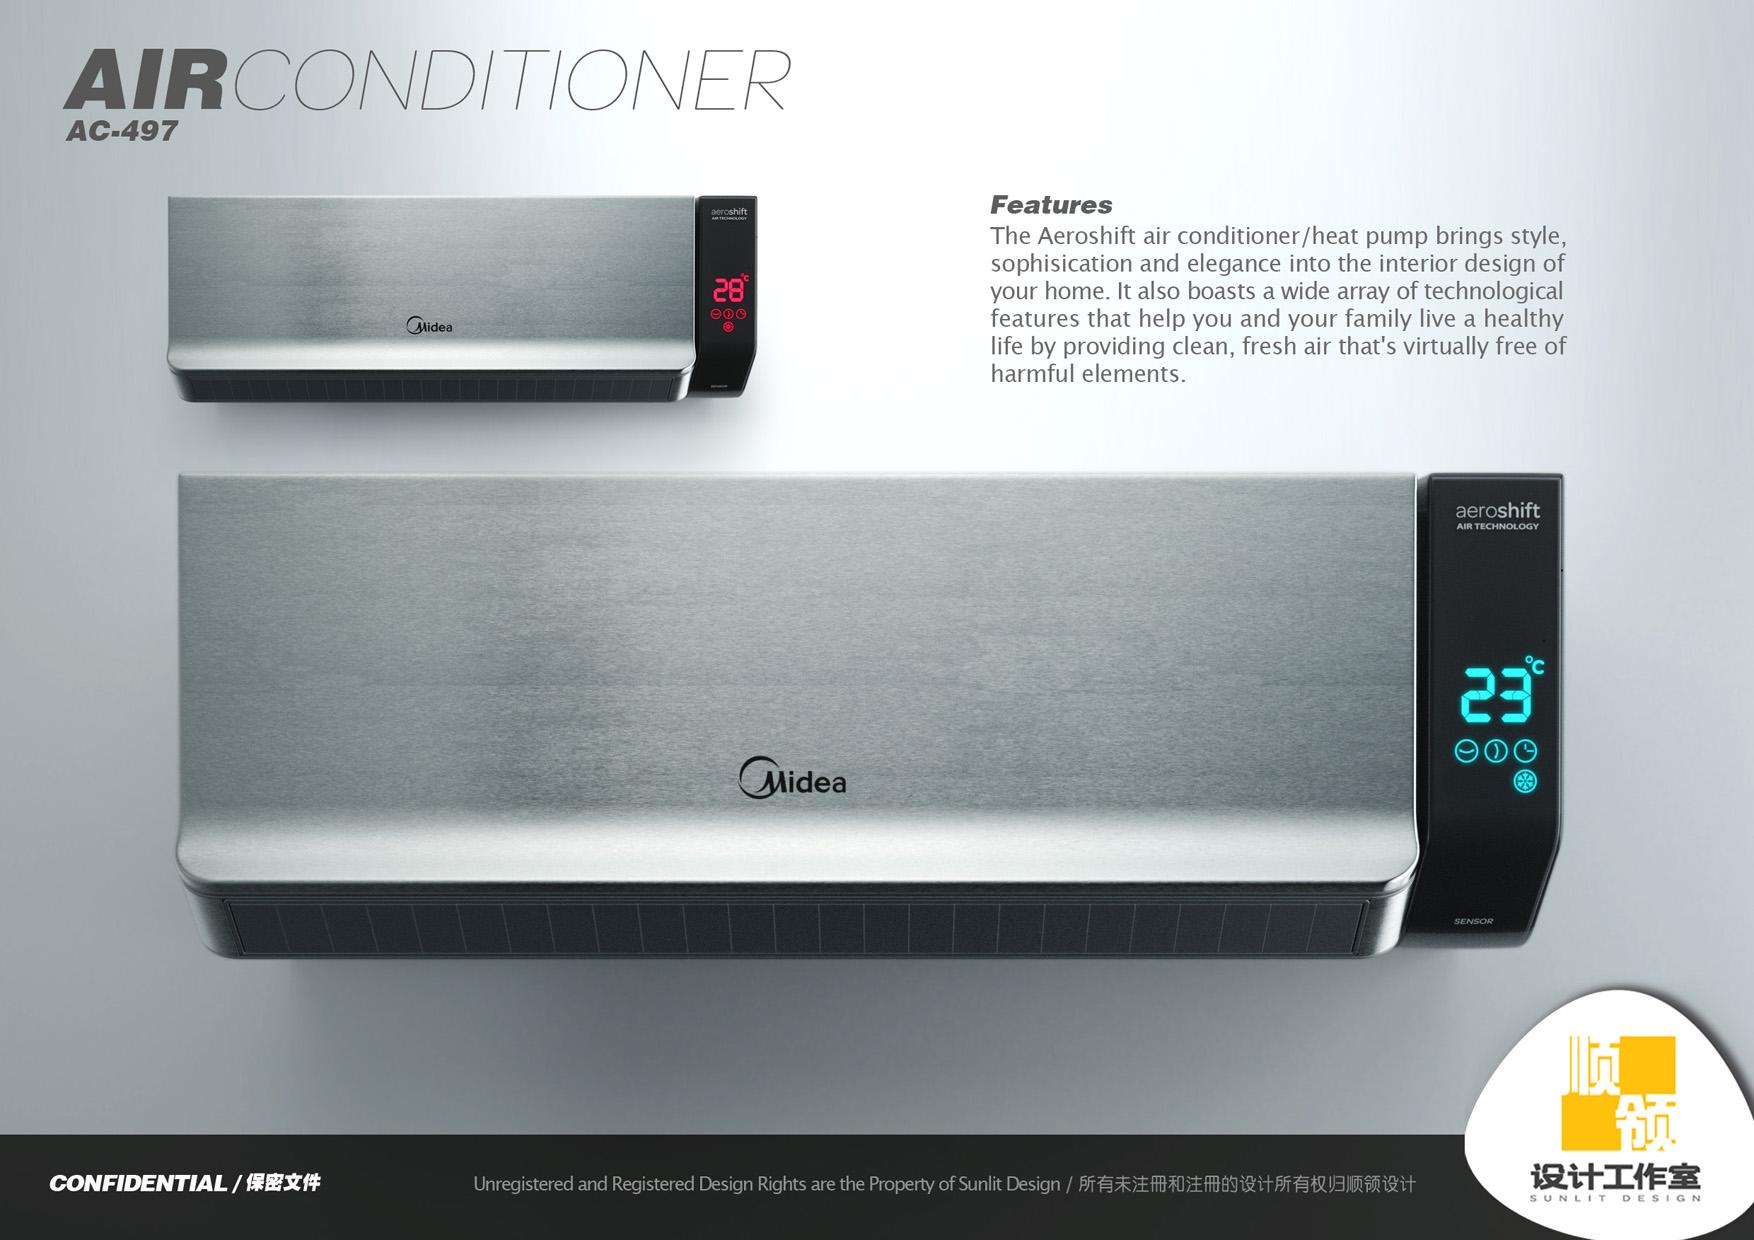 Midea Air Conditioner by Hugo Cailleton at Coroflot.com #CB9700